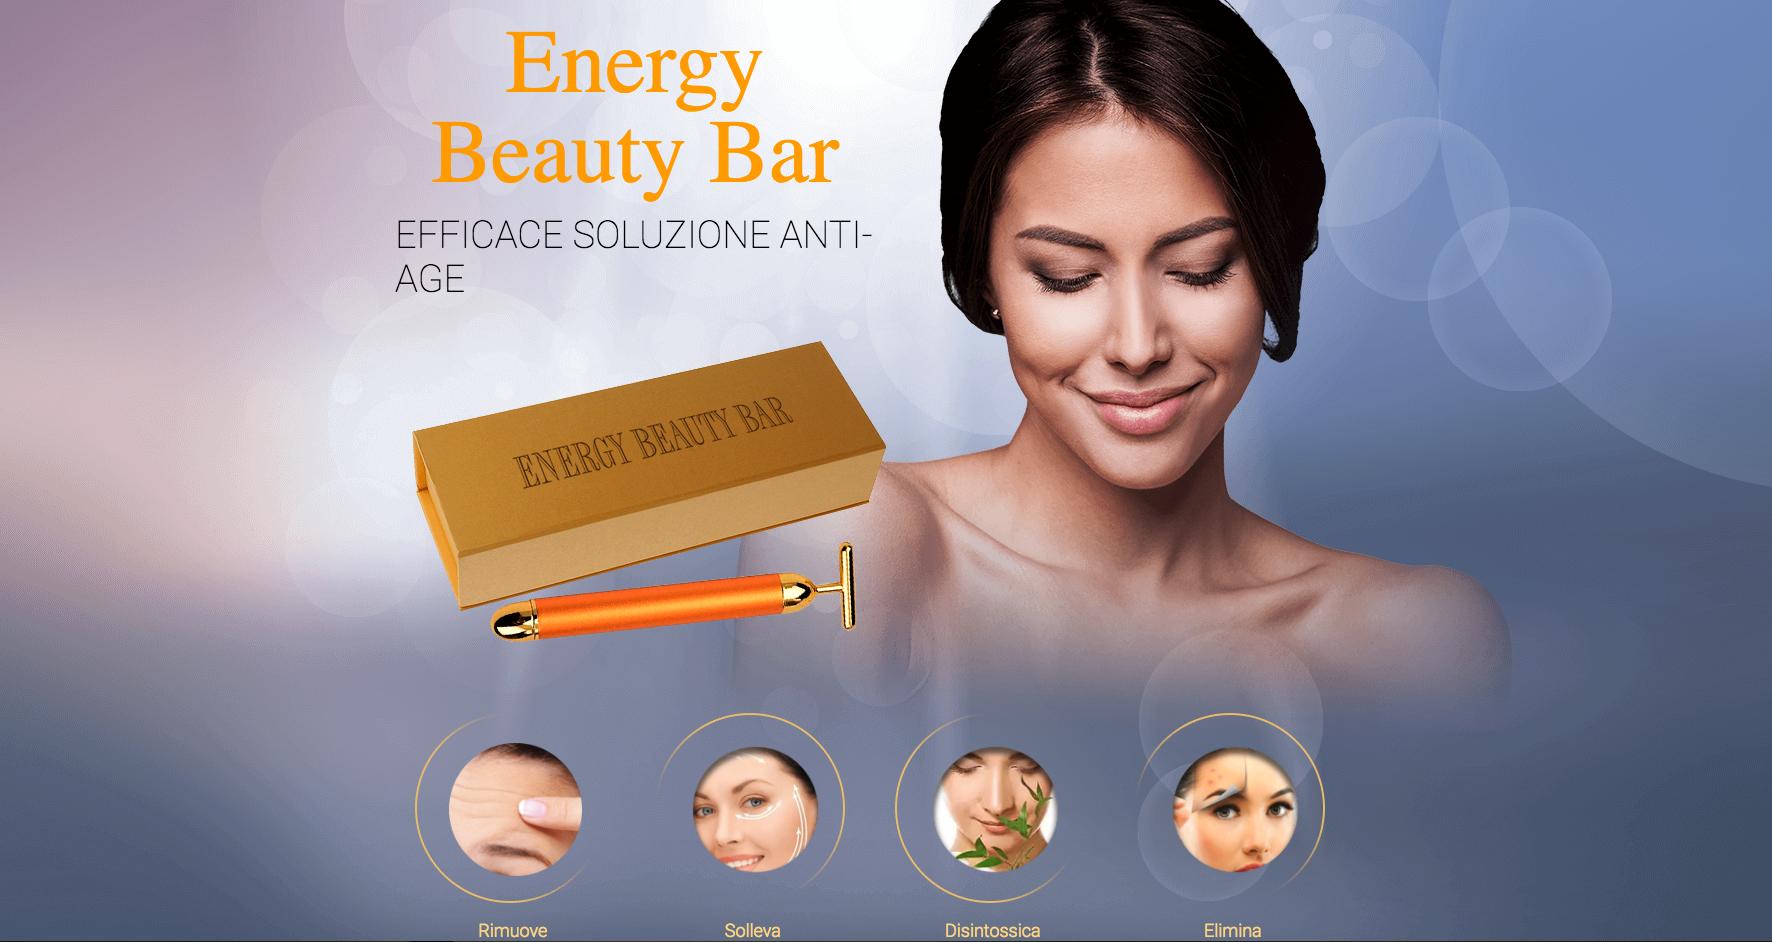 Energy Beauty Bar massaggiatore anti age recensione